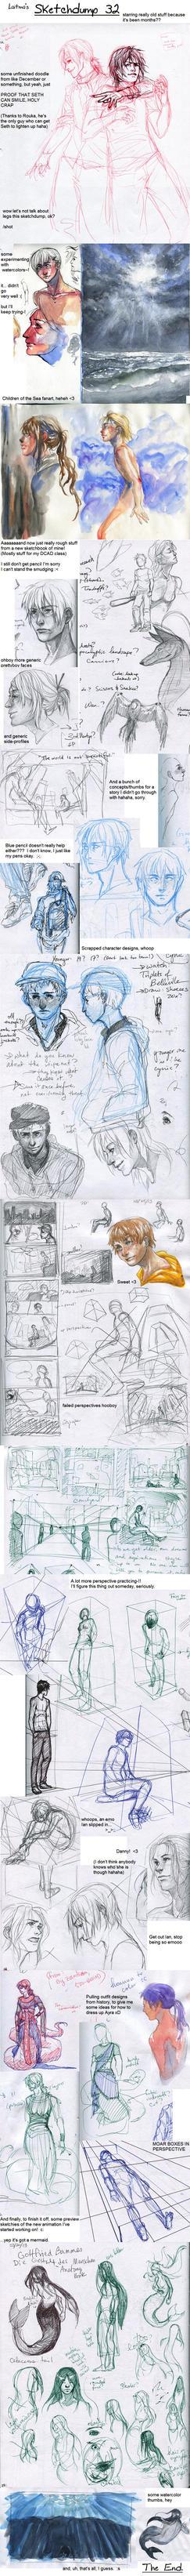 Sketchdump 32 by Laitma